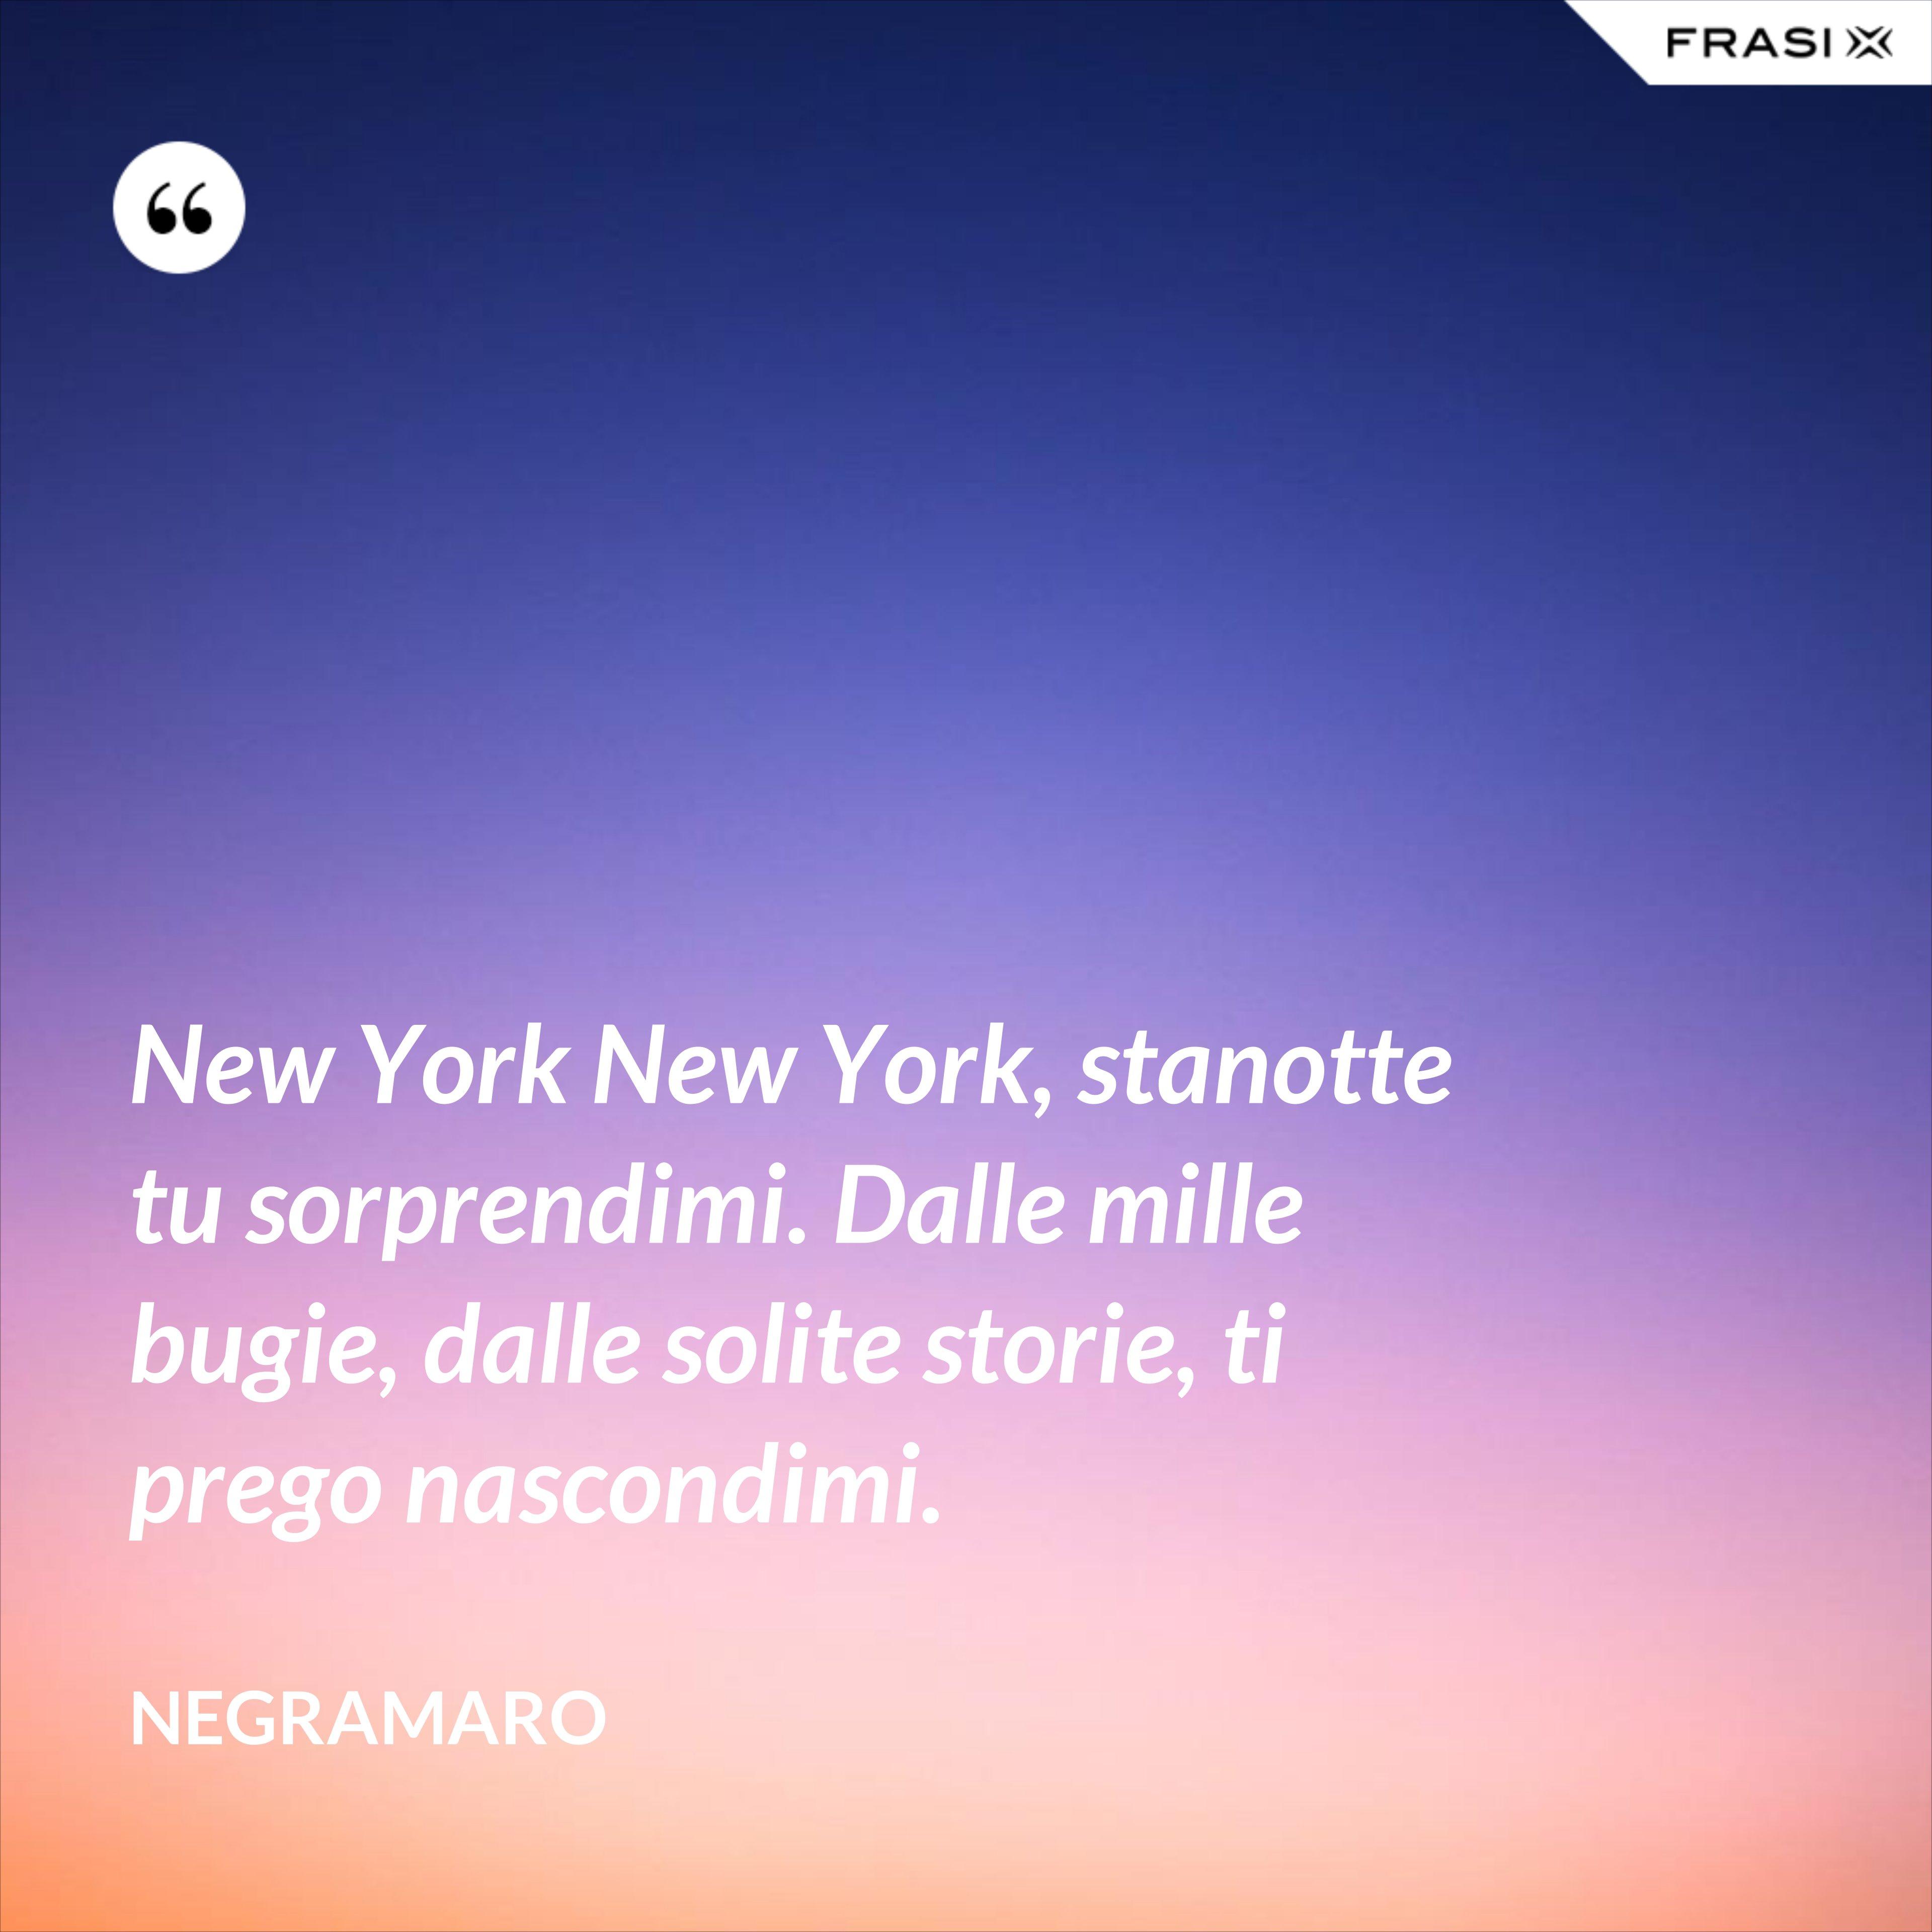 New York New York, stanotte tu sorprendimi. Dalle mille bugie, dalle solite storie, ti prego nascondimi. - Negramaro